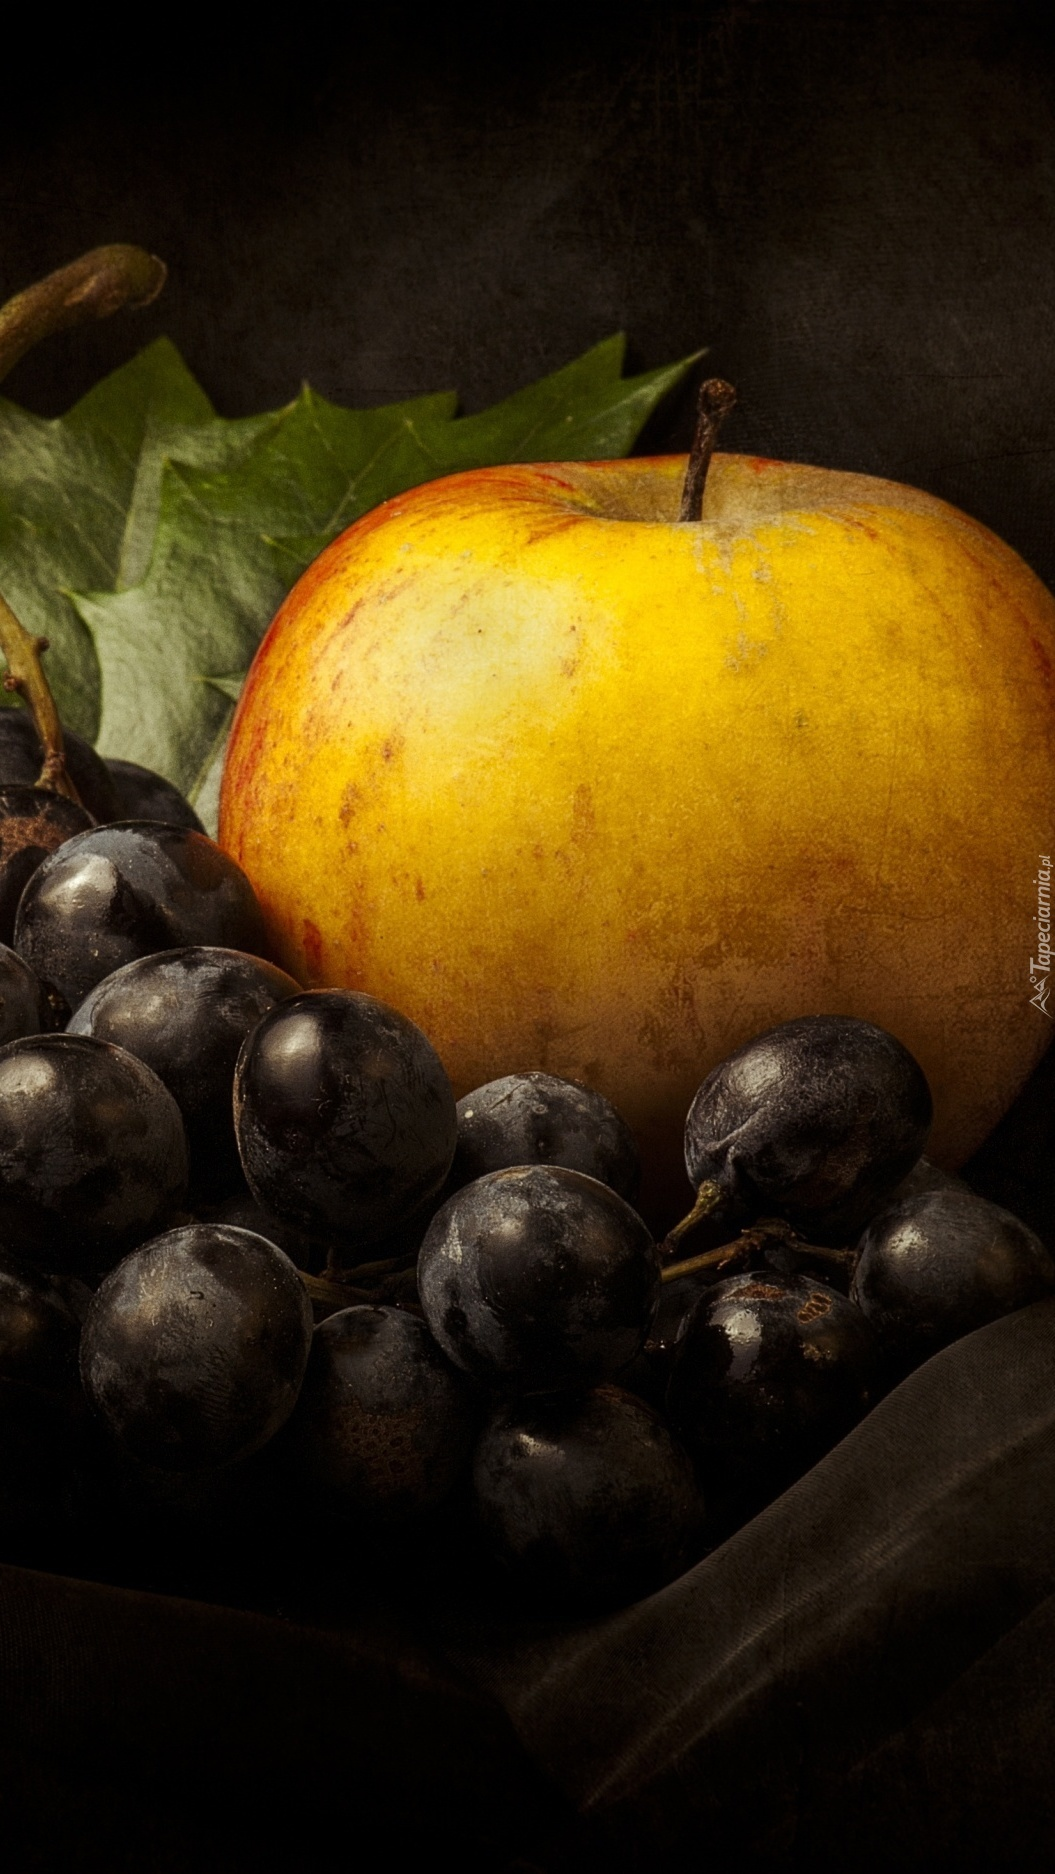 Owoce podano